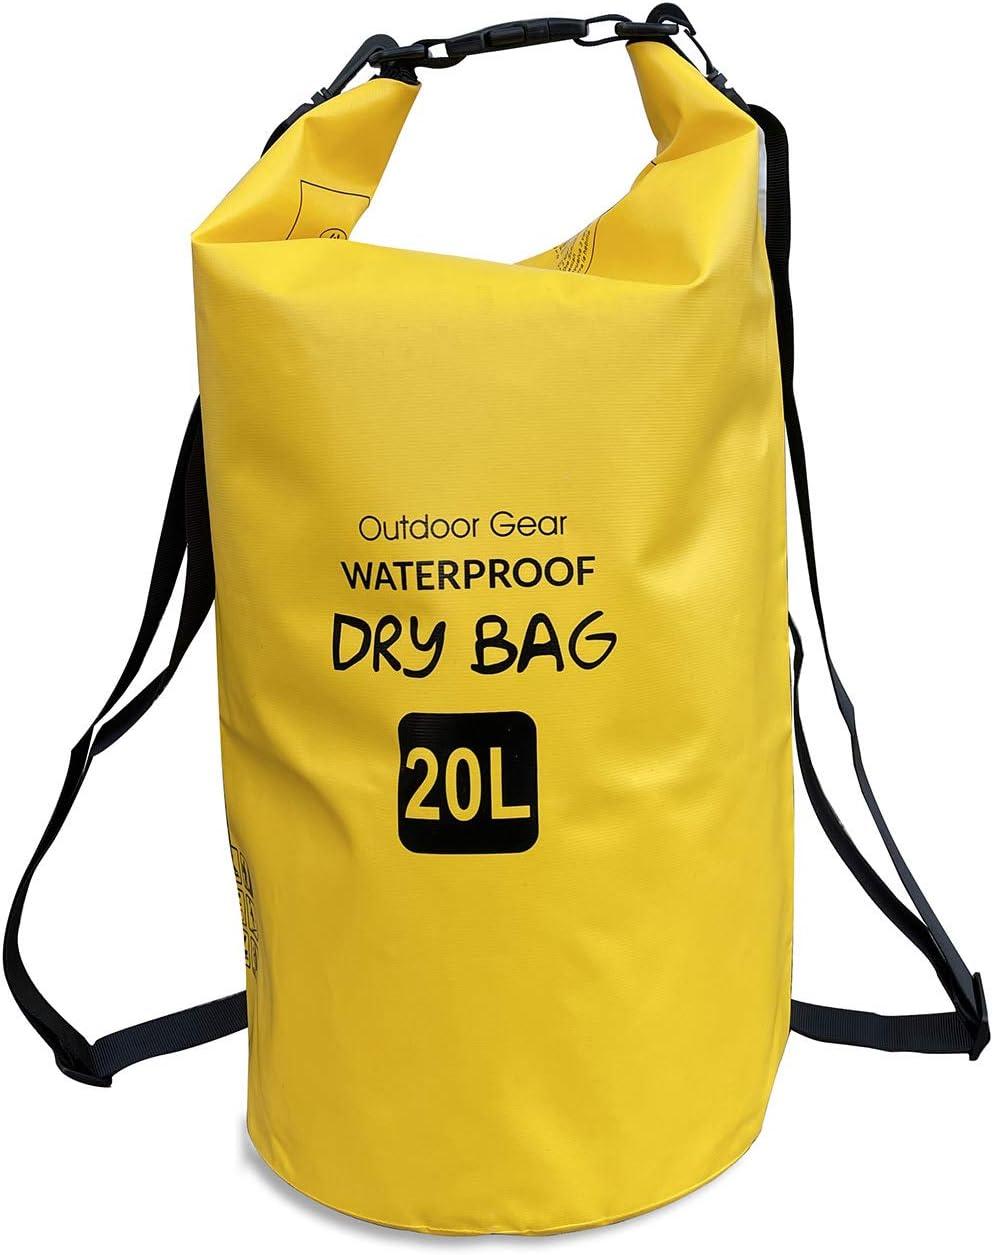 EliteShield Waterproof Heavy Duty Free Shipping New Regular discount Dry Backpack Clos Bag Roll Top